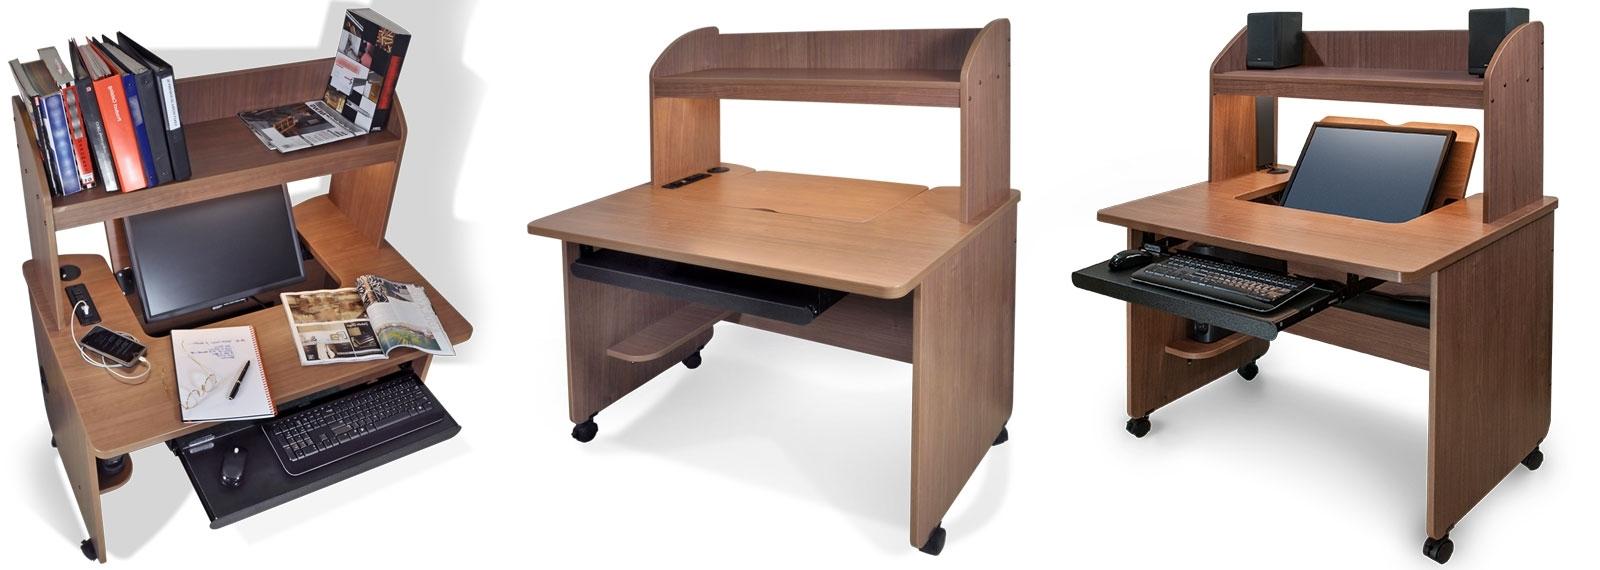 Computer Desks For Schools Intended For Popular Smart Desks : School & Classroom Computer Desks (View 4 of 20)